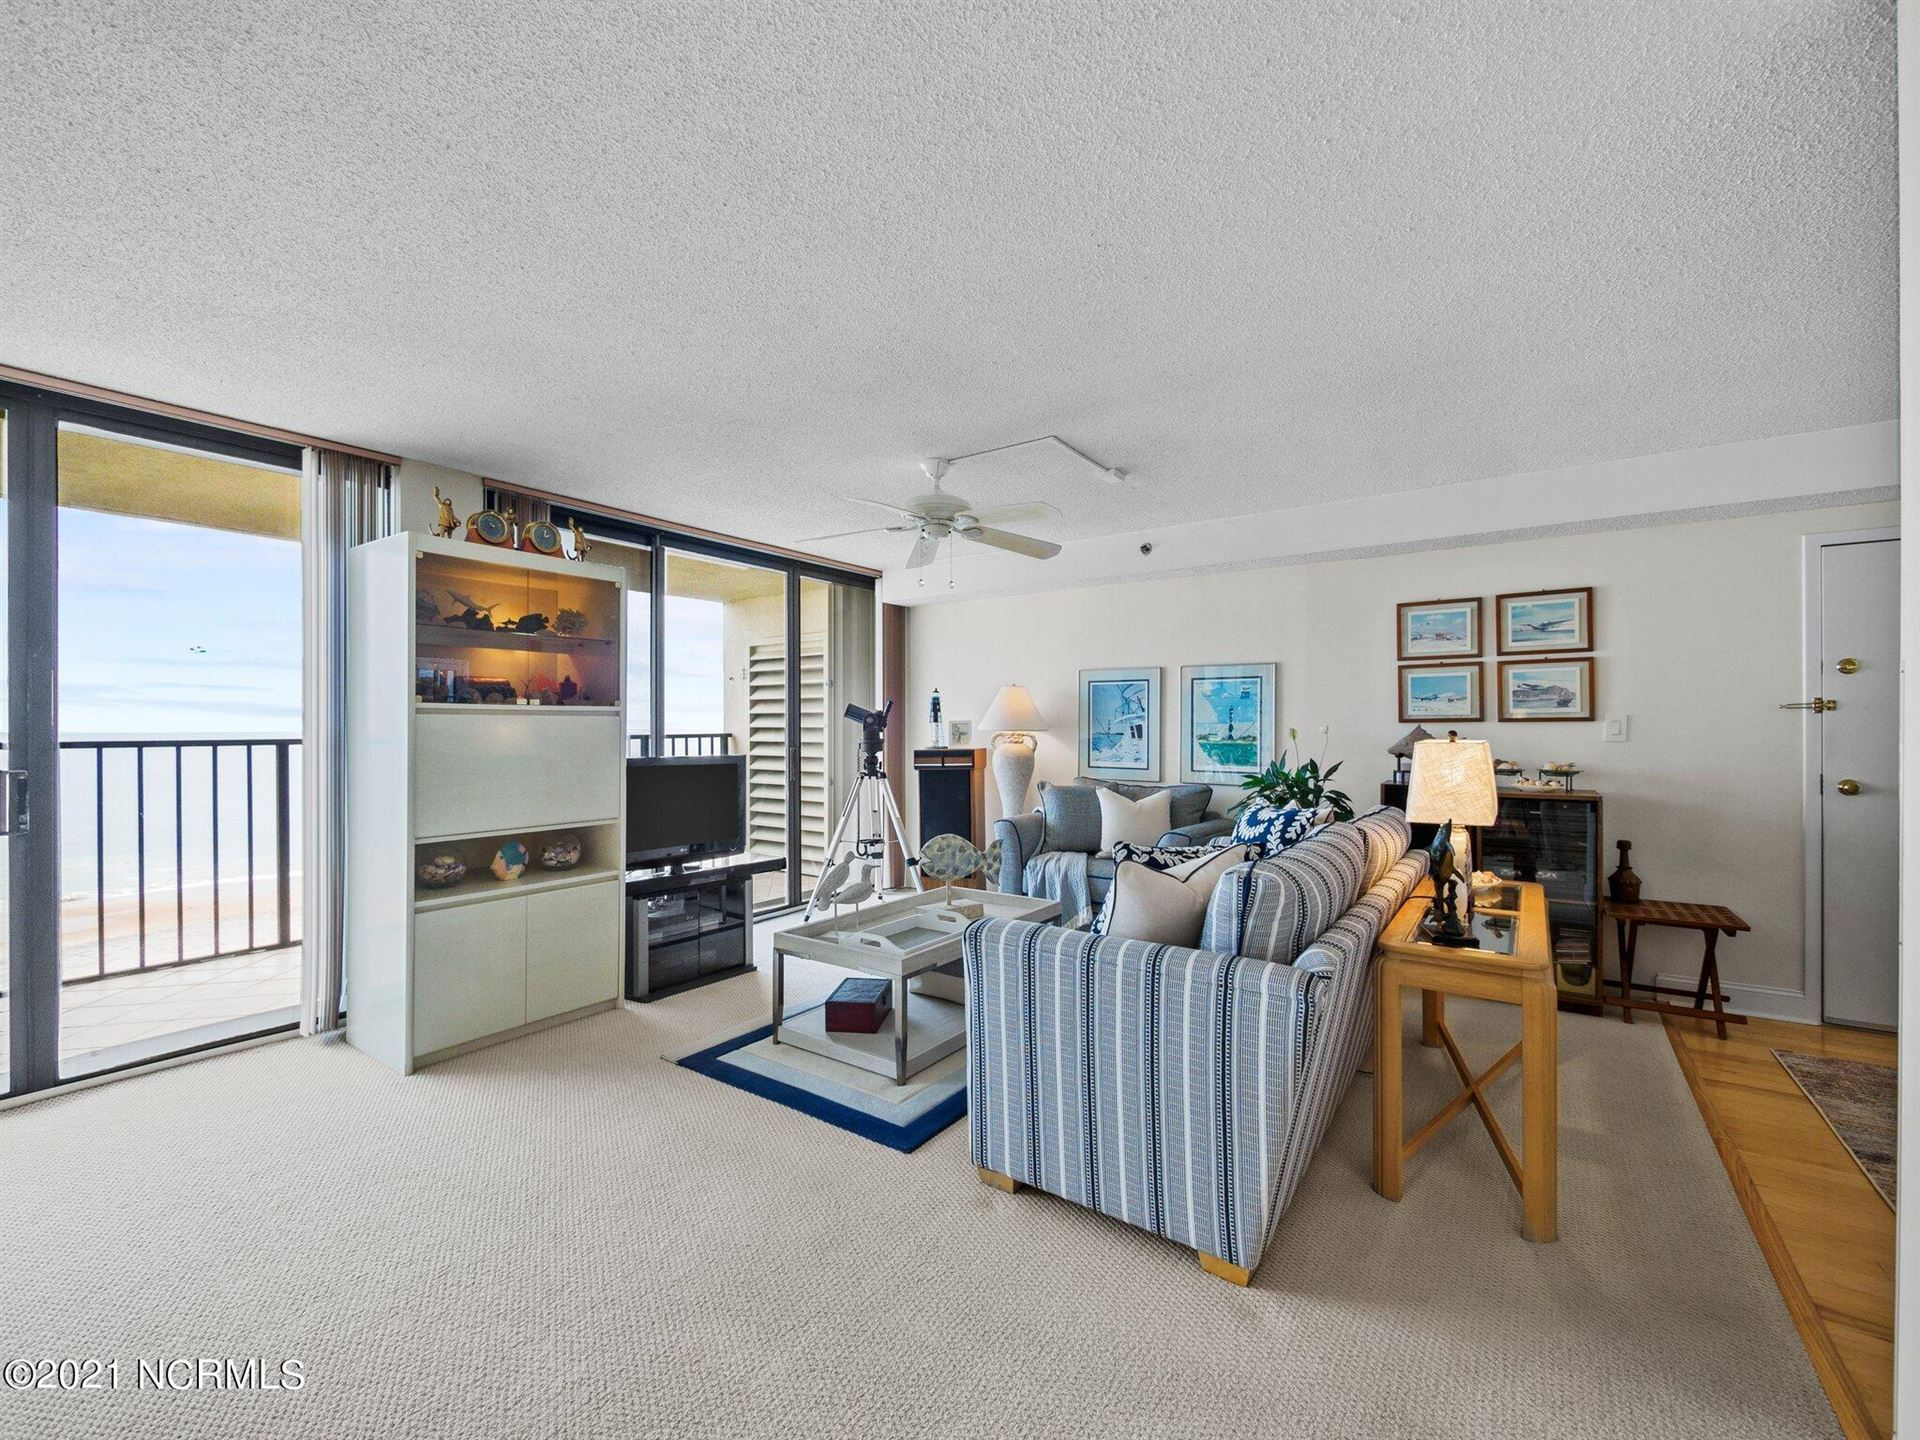 Photo of 4110 N Island Drive #Unit 202, North Topsail Beach, NC 28460 (MLS # 100294423)